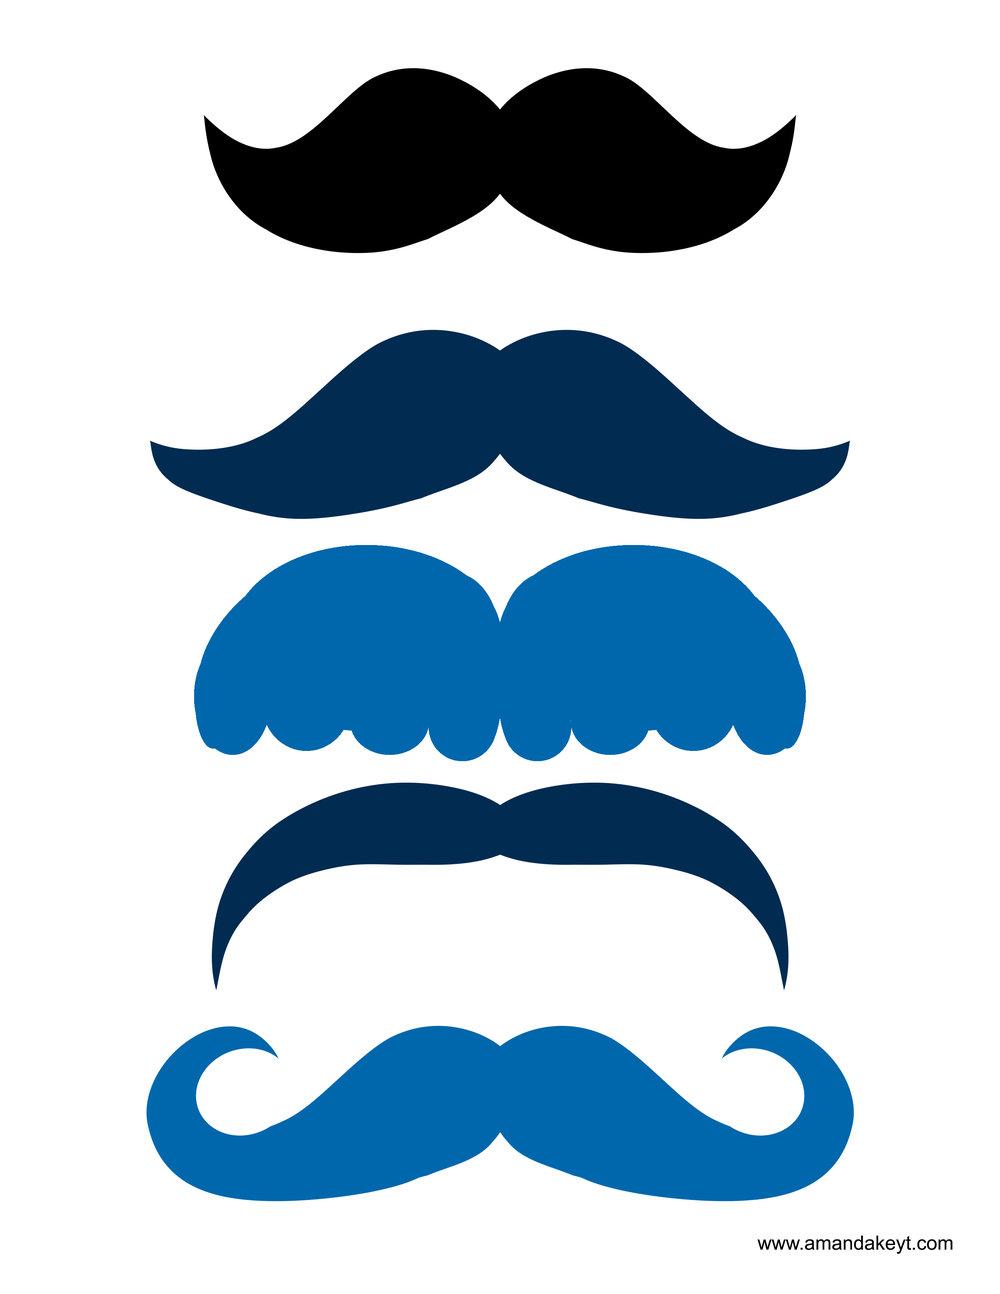 Mustaches6.jpg